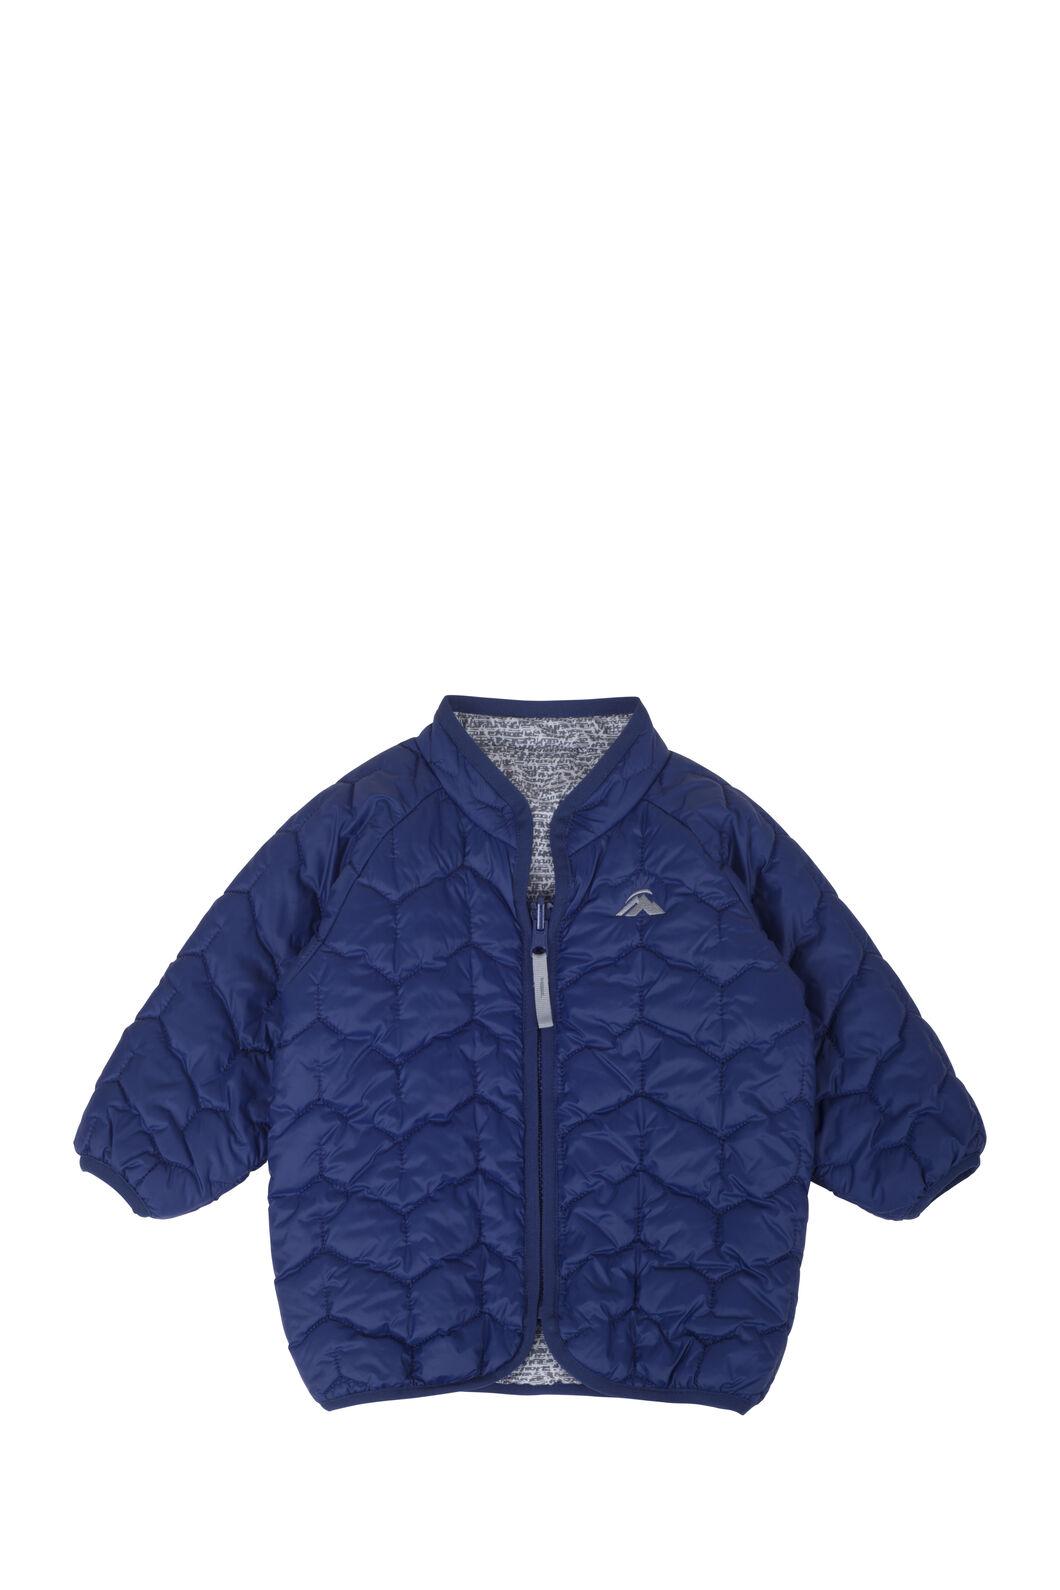 Macpac Pulsar PrimaLoft® Jacket - Baby, Medieval Blue, hi-res